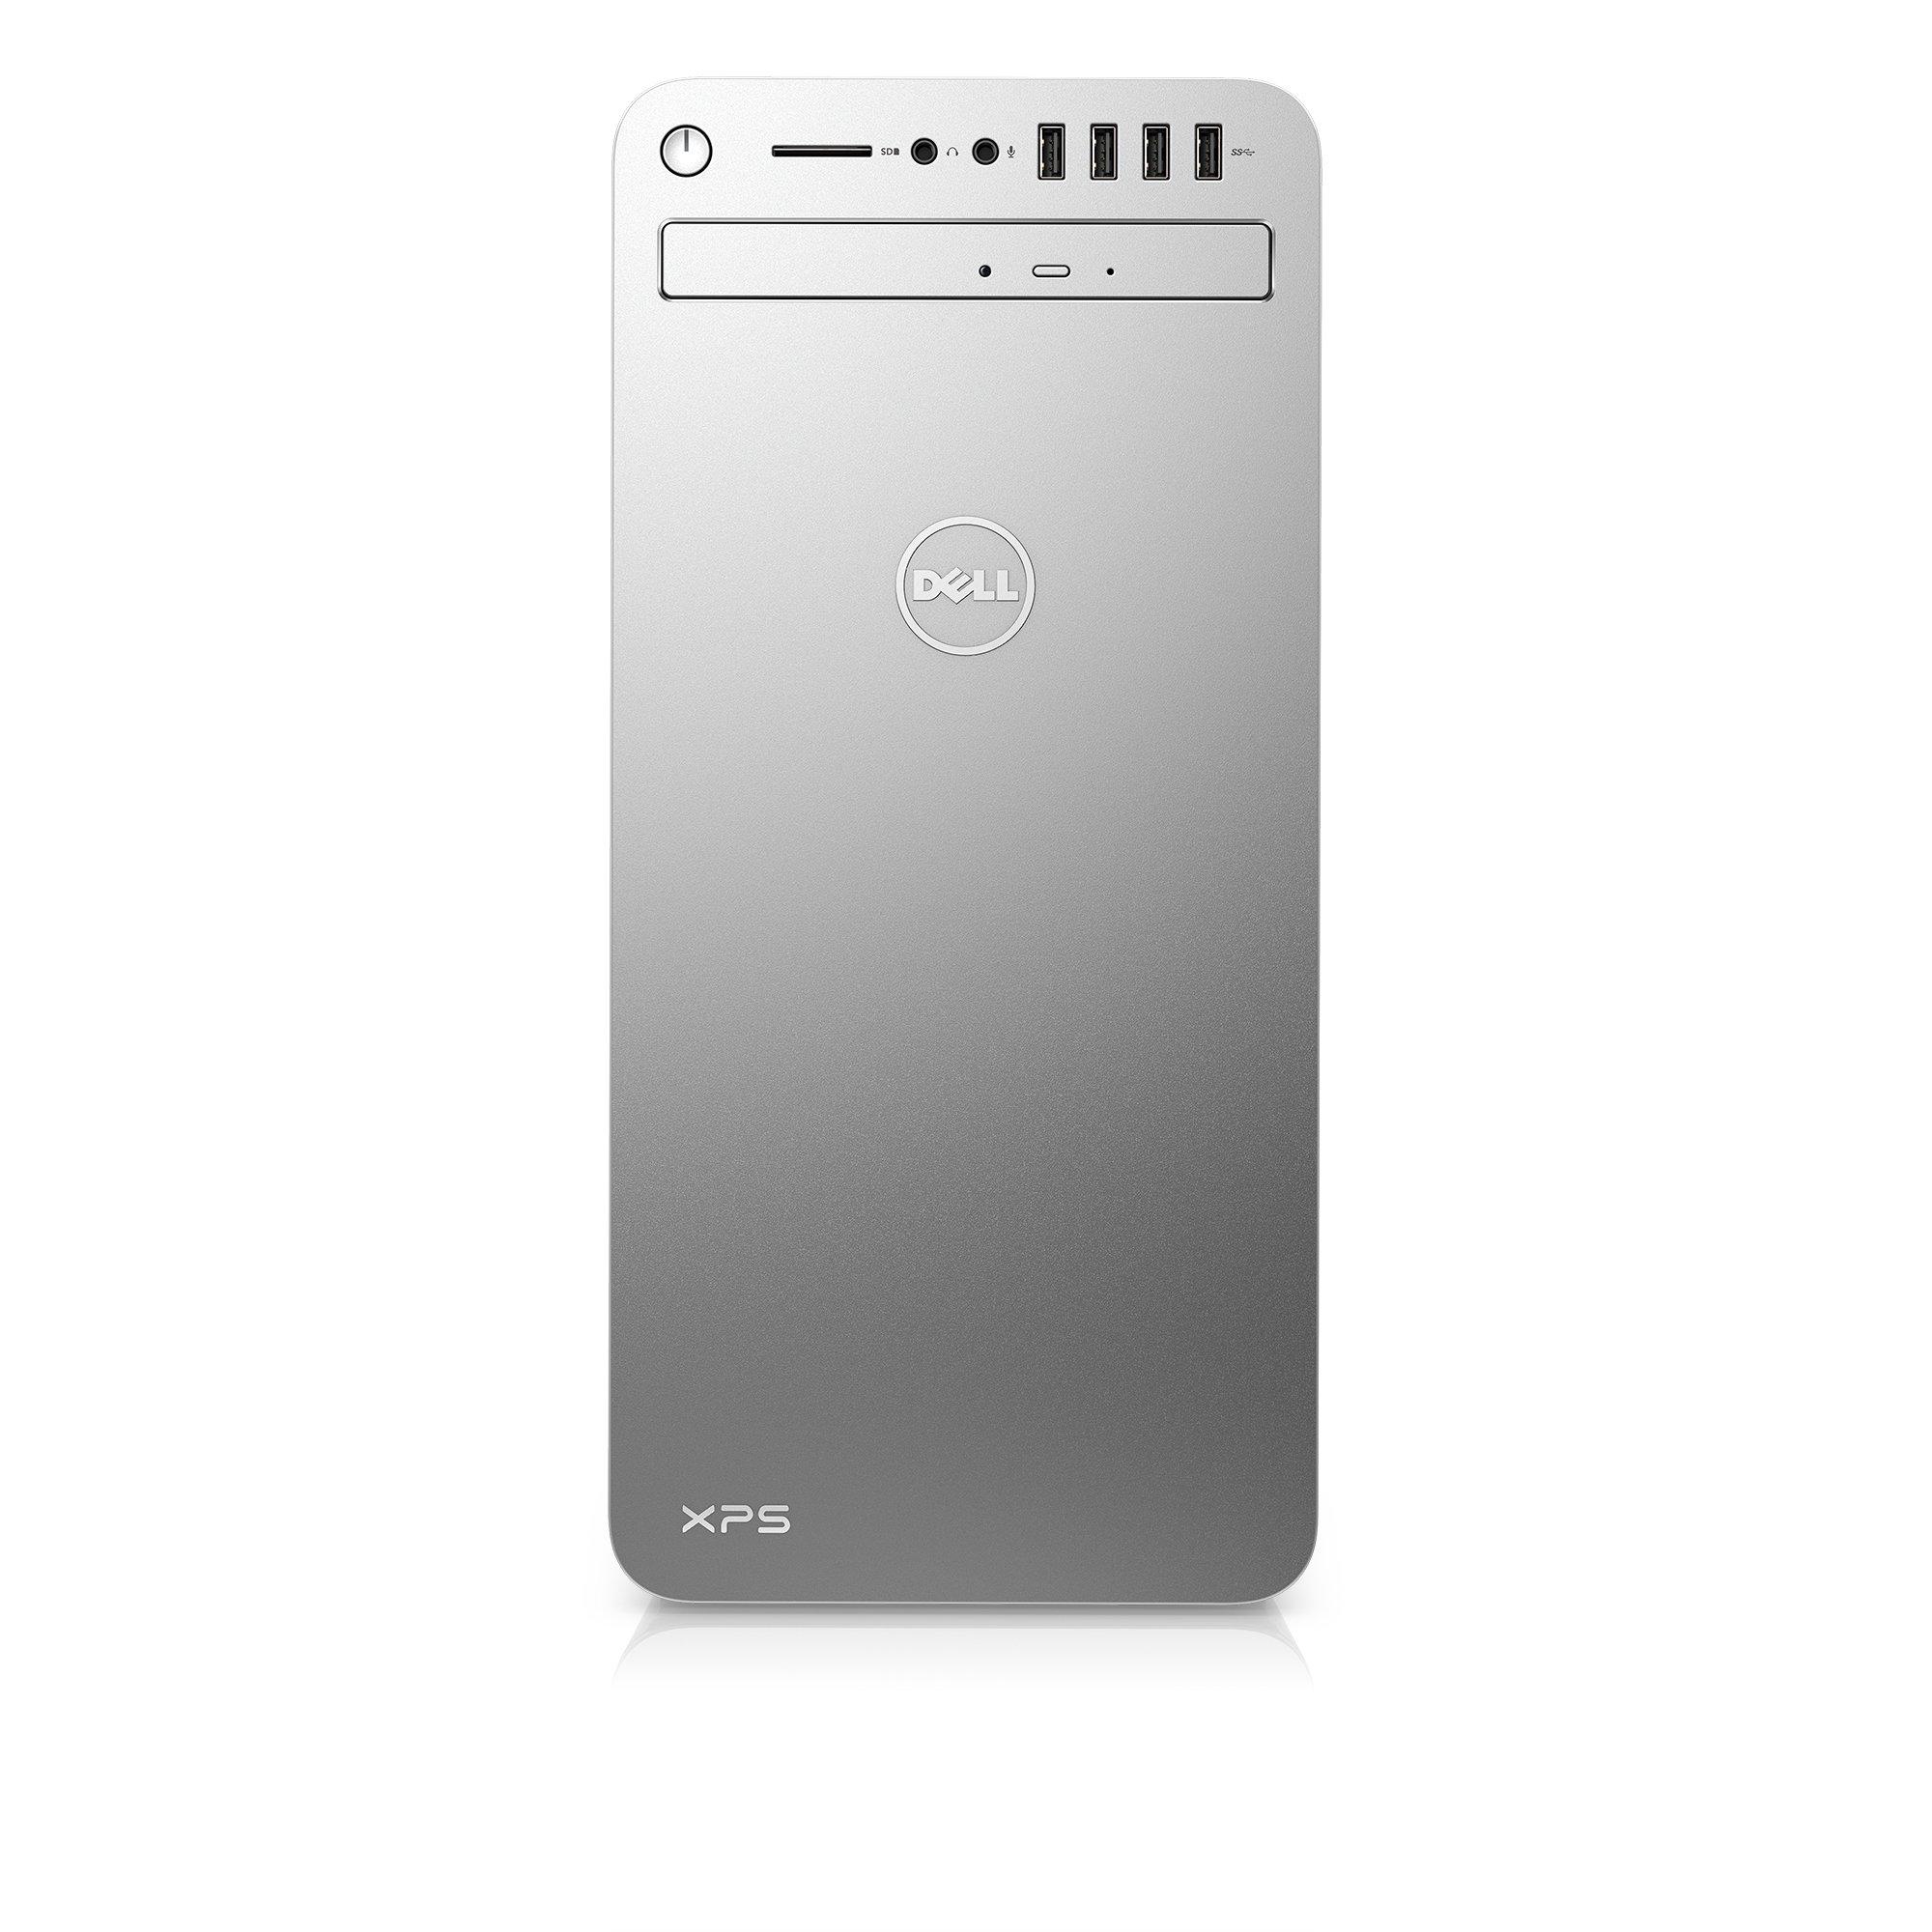 Dell XPSE8910-7942SLV Desktop (6th Gen Intel Core i7, 16GB RAM, 2 TB HDD) NVIDIA Gaming GPU GTX 1070, Silver by Dell